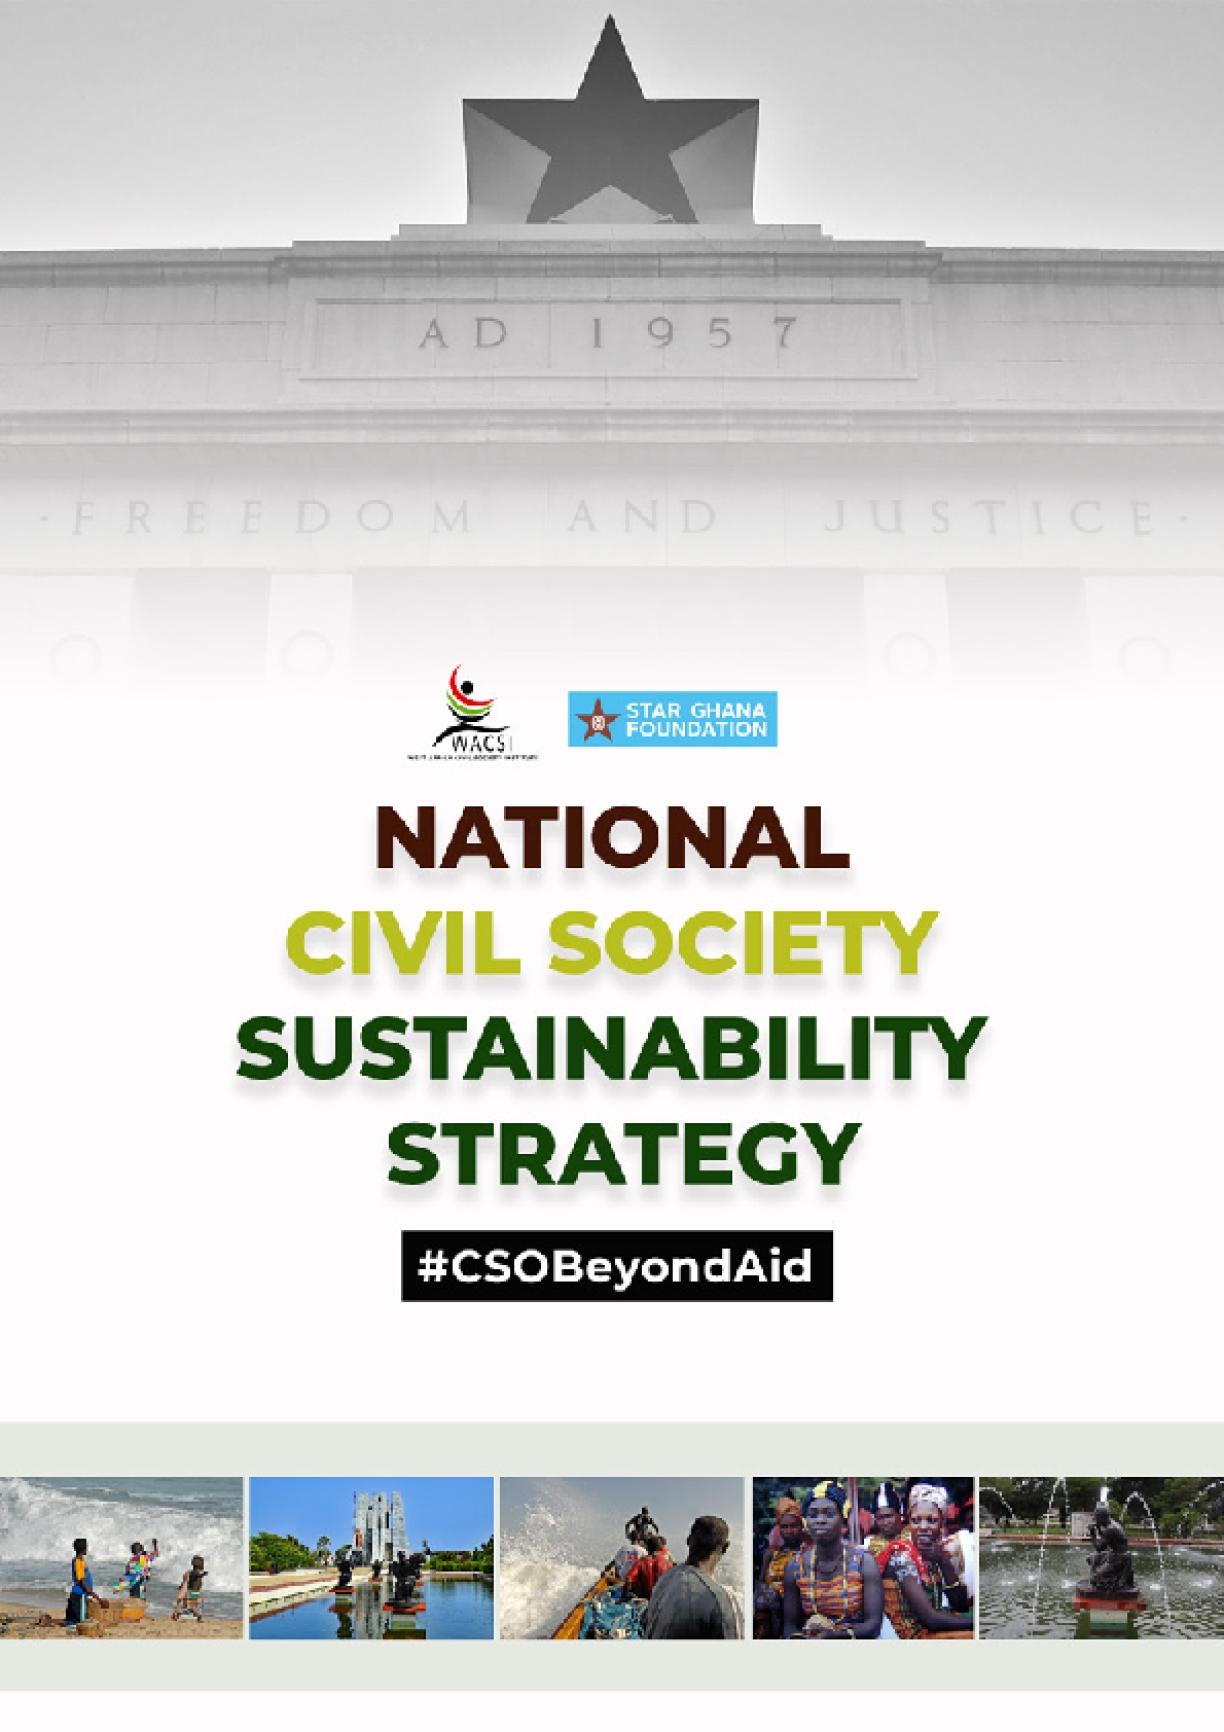 National Civil Society Sustainability Strategy for Civil Society in Ghana